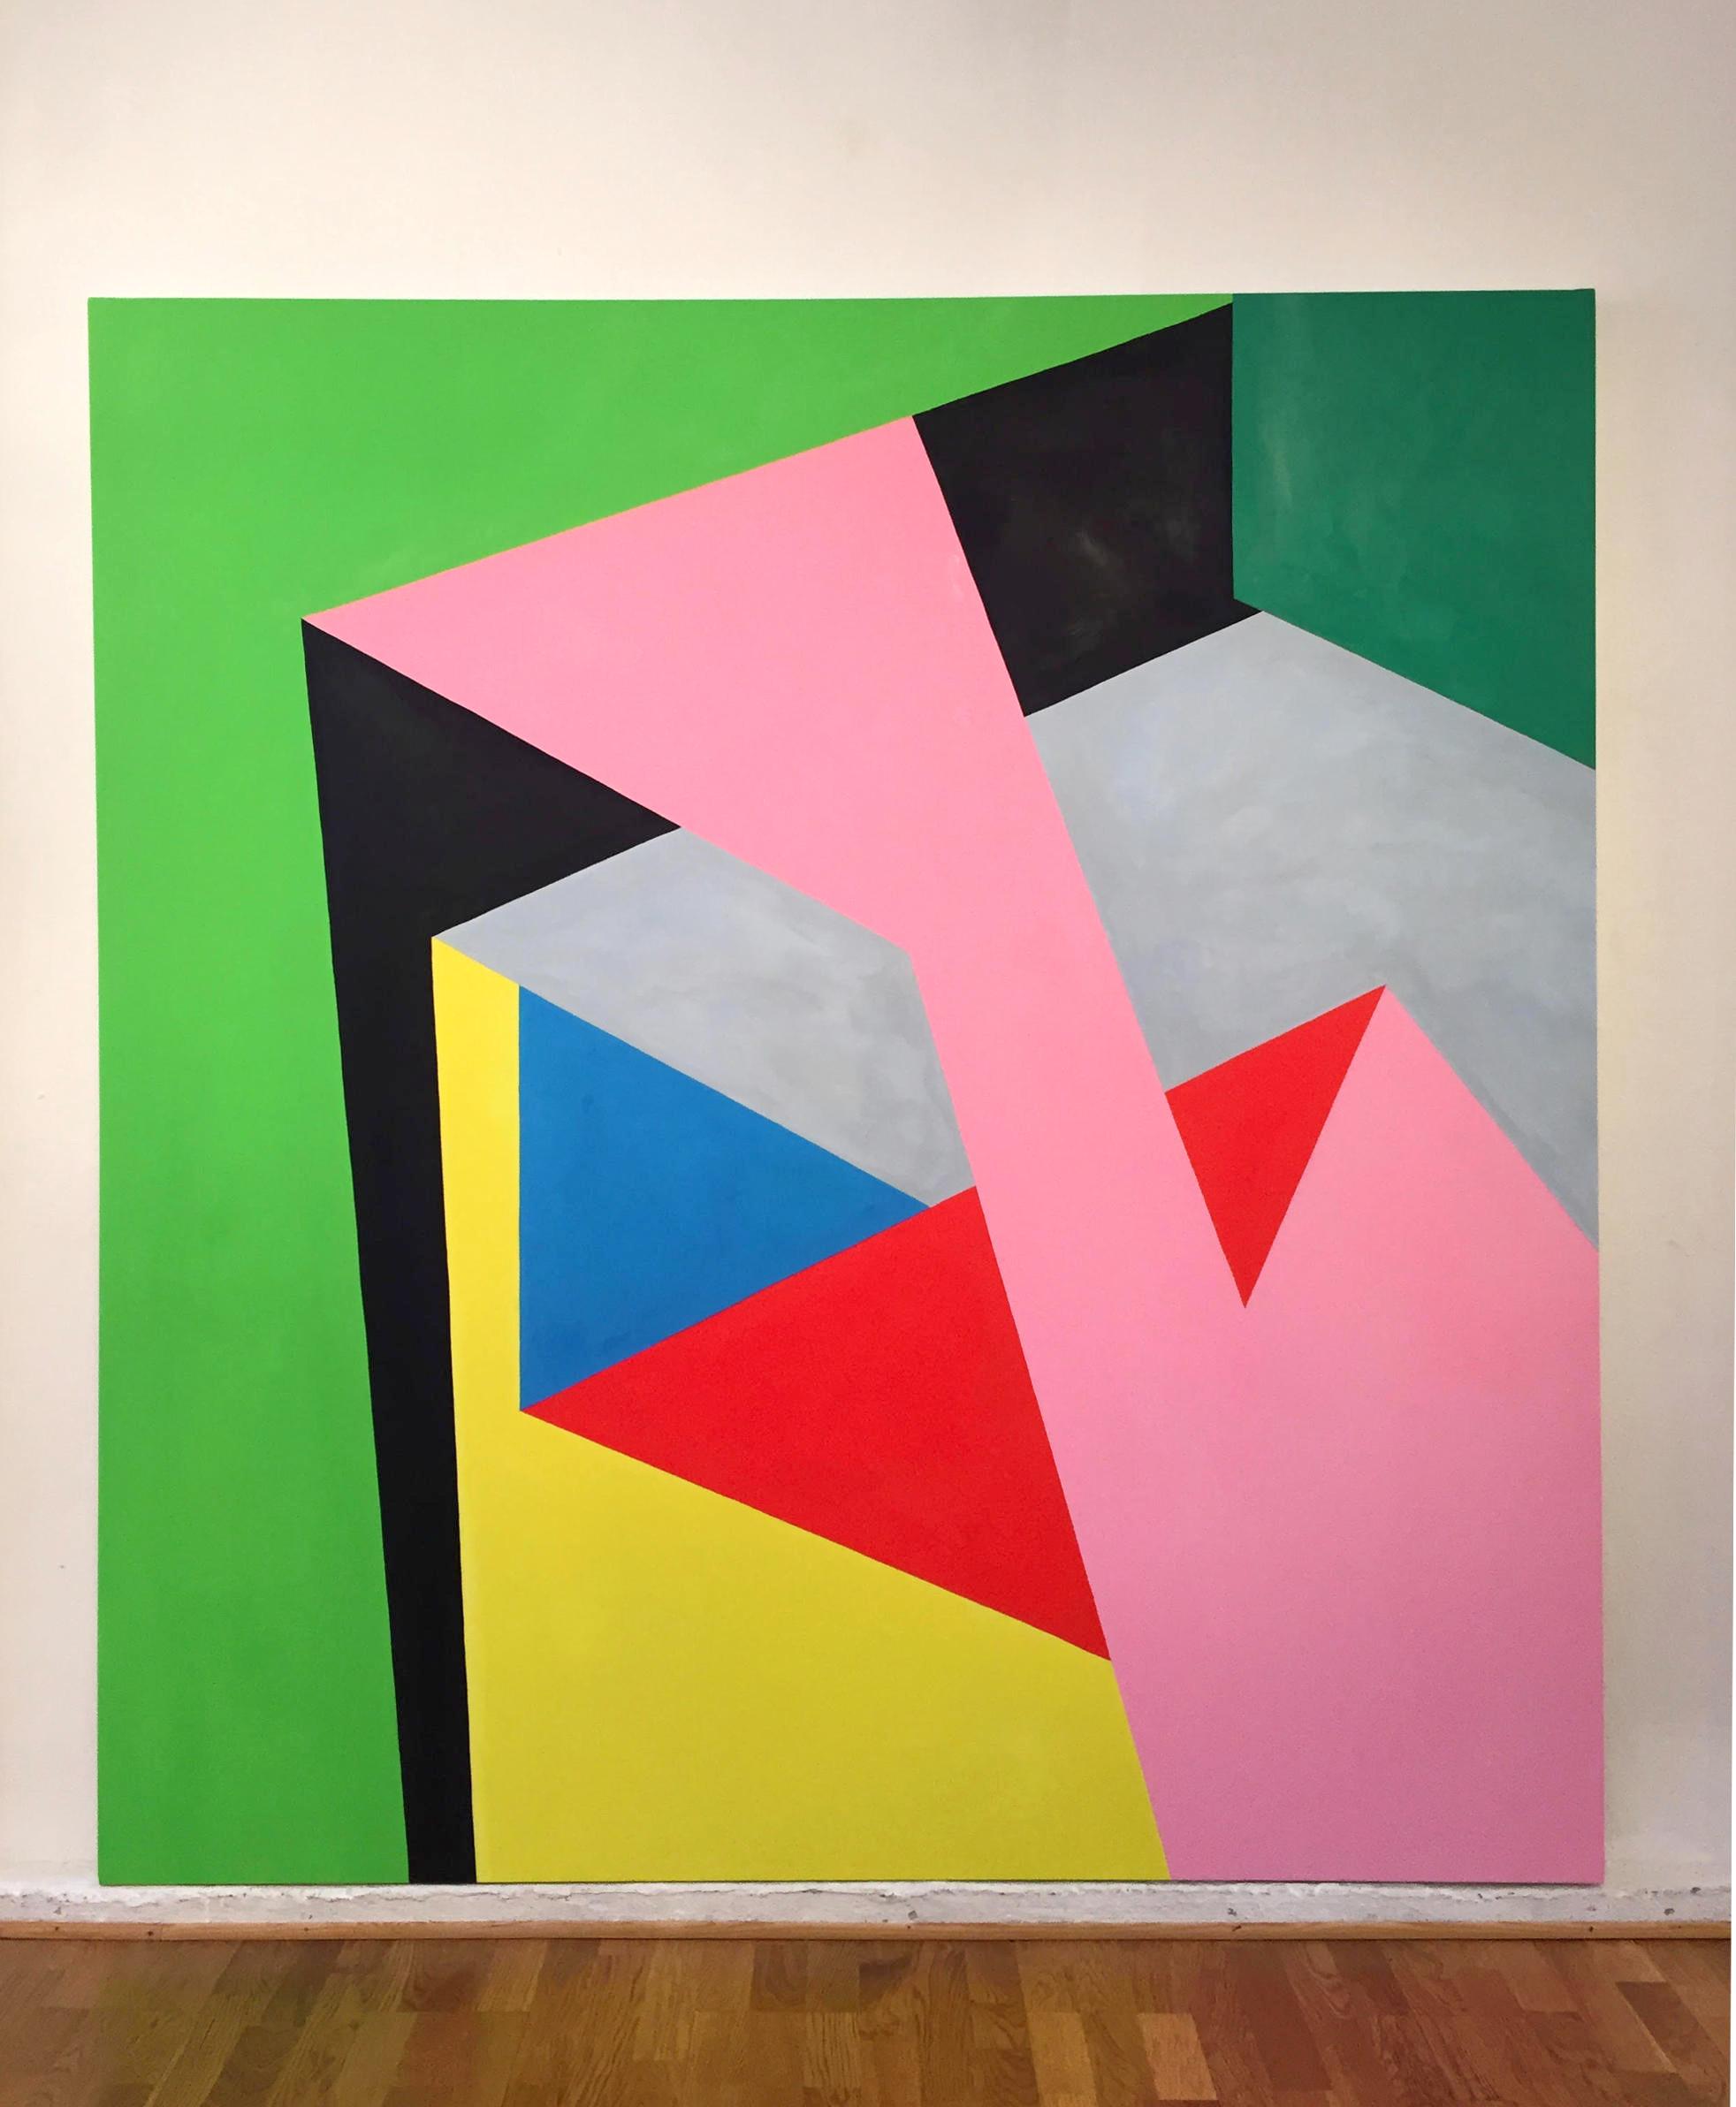 Nicola Melinelli, ST, olio su tela 200x190cm - 2016